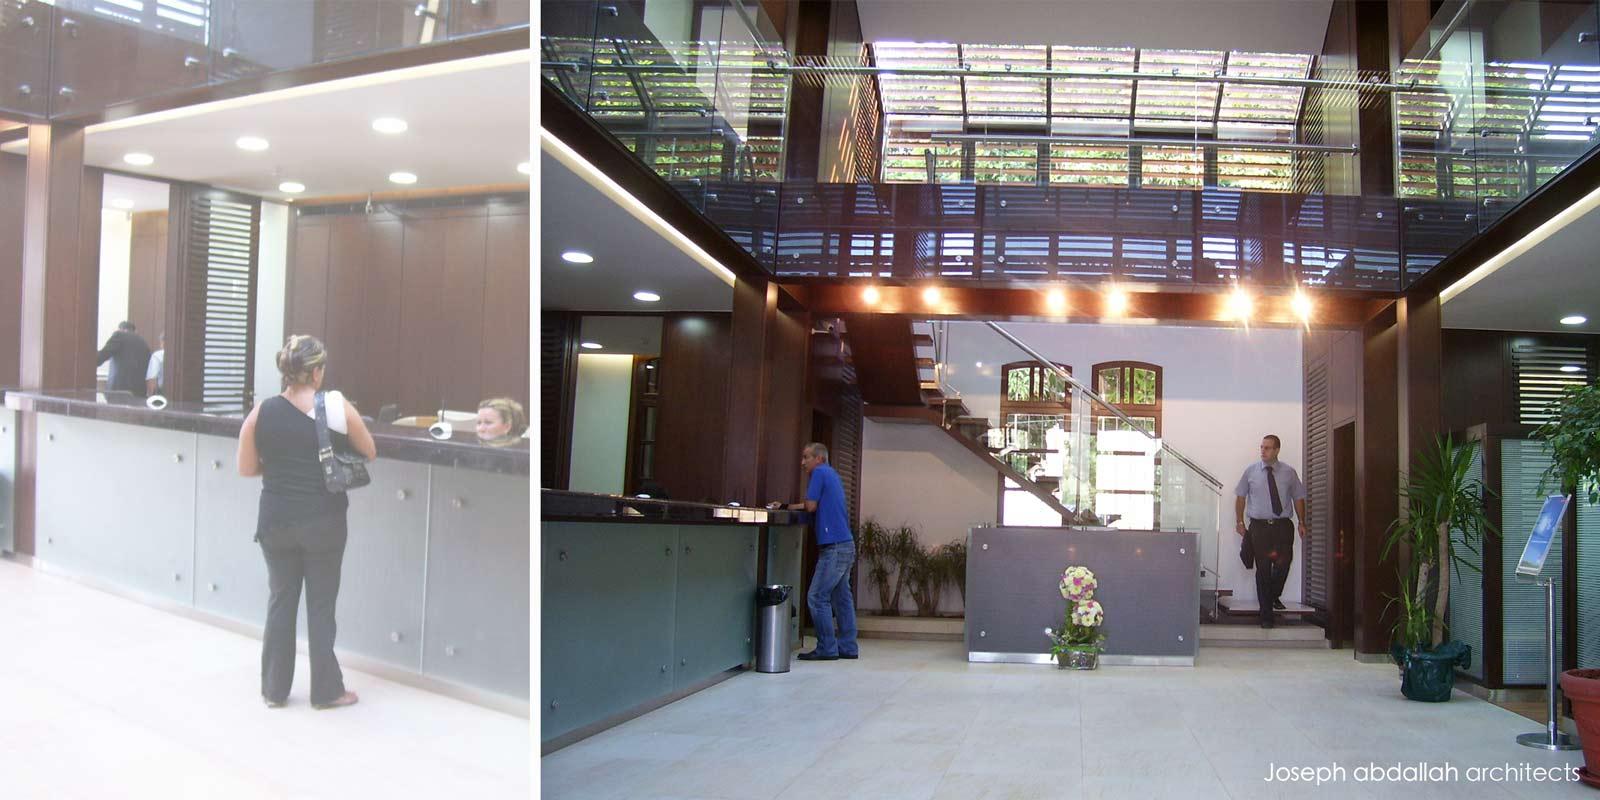 bank-lcb-sgbl-apotres-restoration-architecture-joseph-abdallah-architects-19